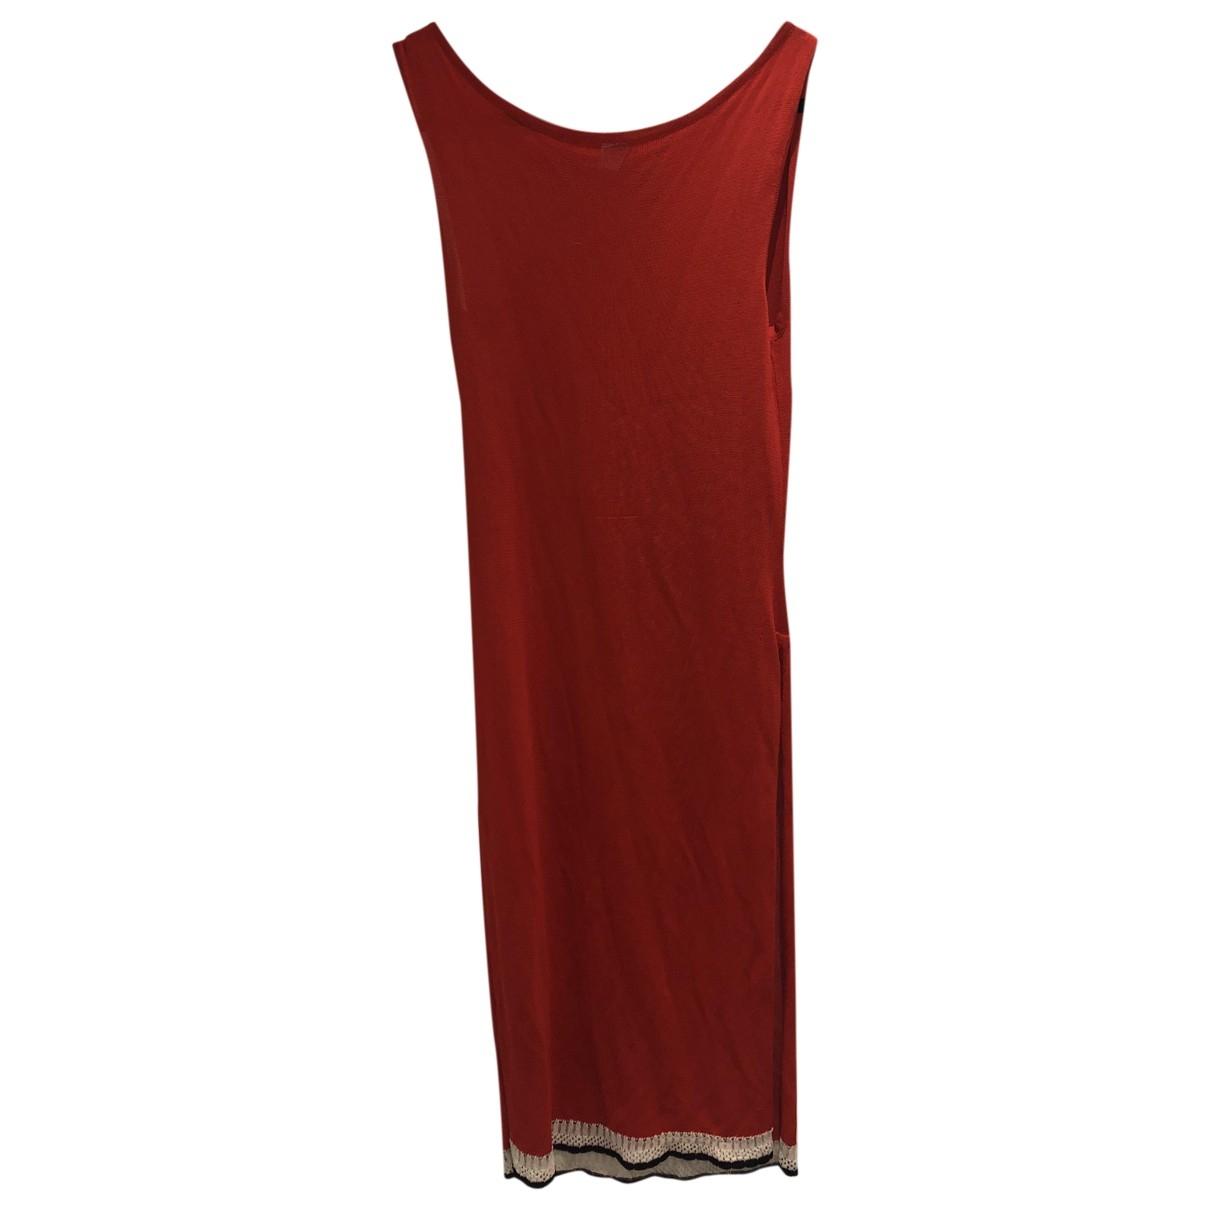 Bella Freud \N Red Cotton - elasthane dress for Women 8 UK